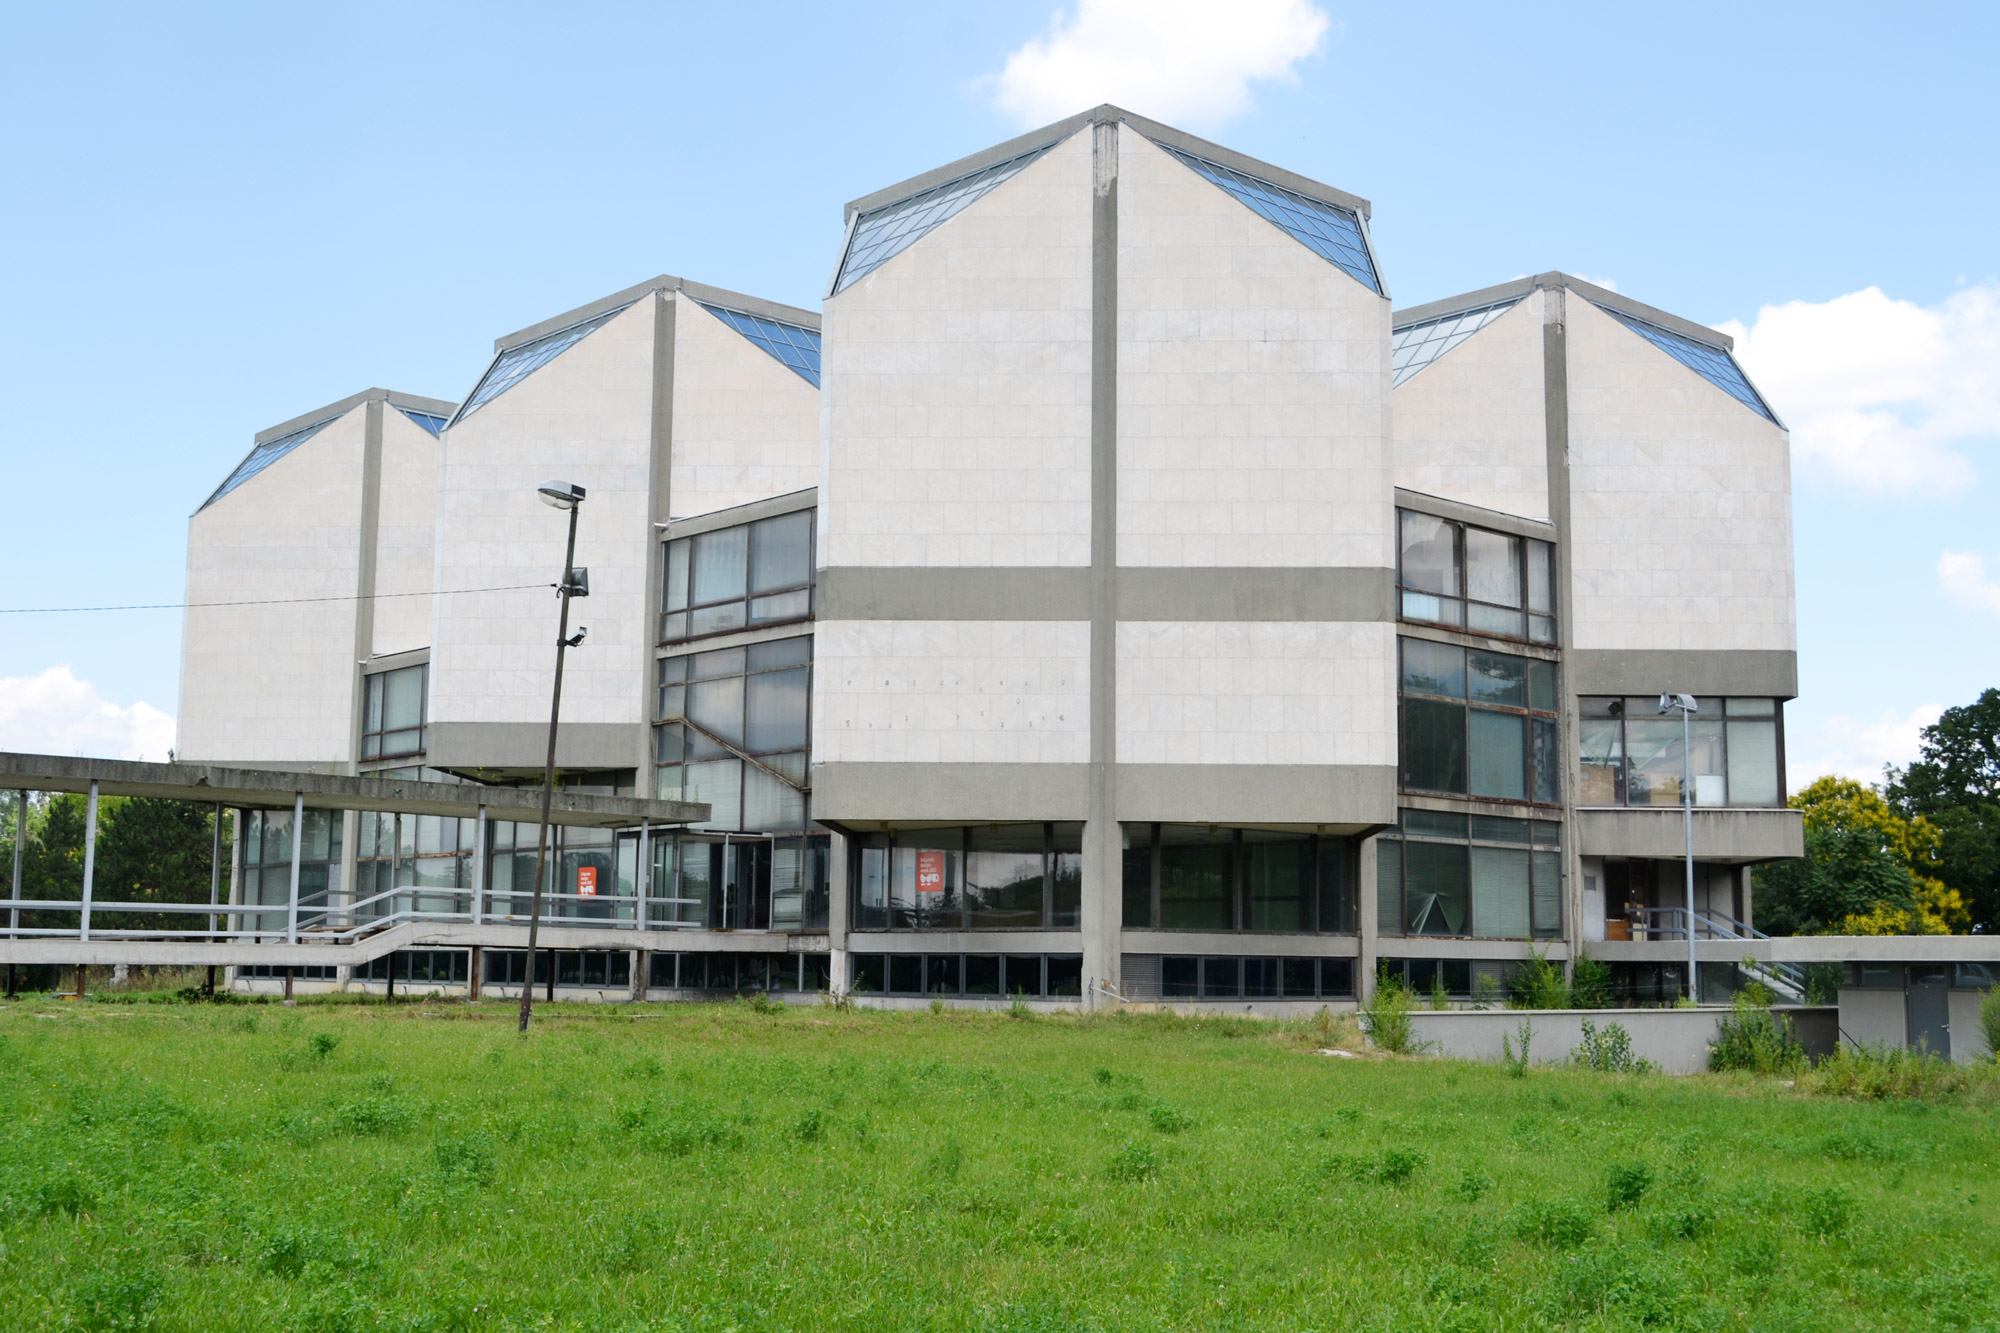 urbanbacklog-belgrade-museum-of-modern-art-1.jpg